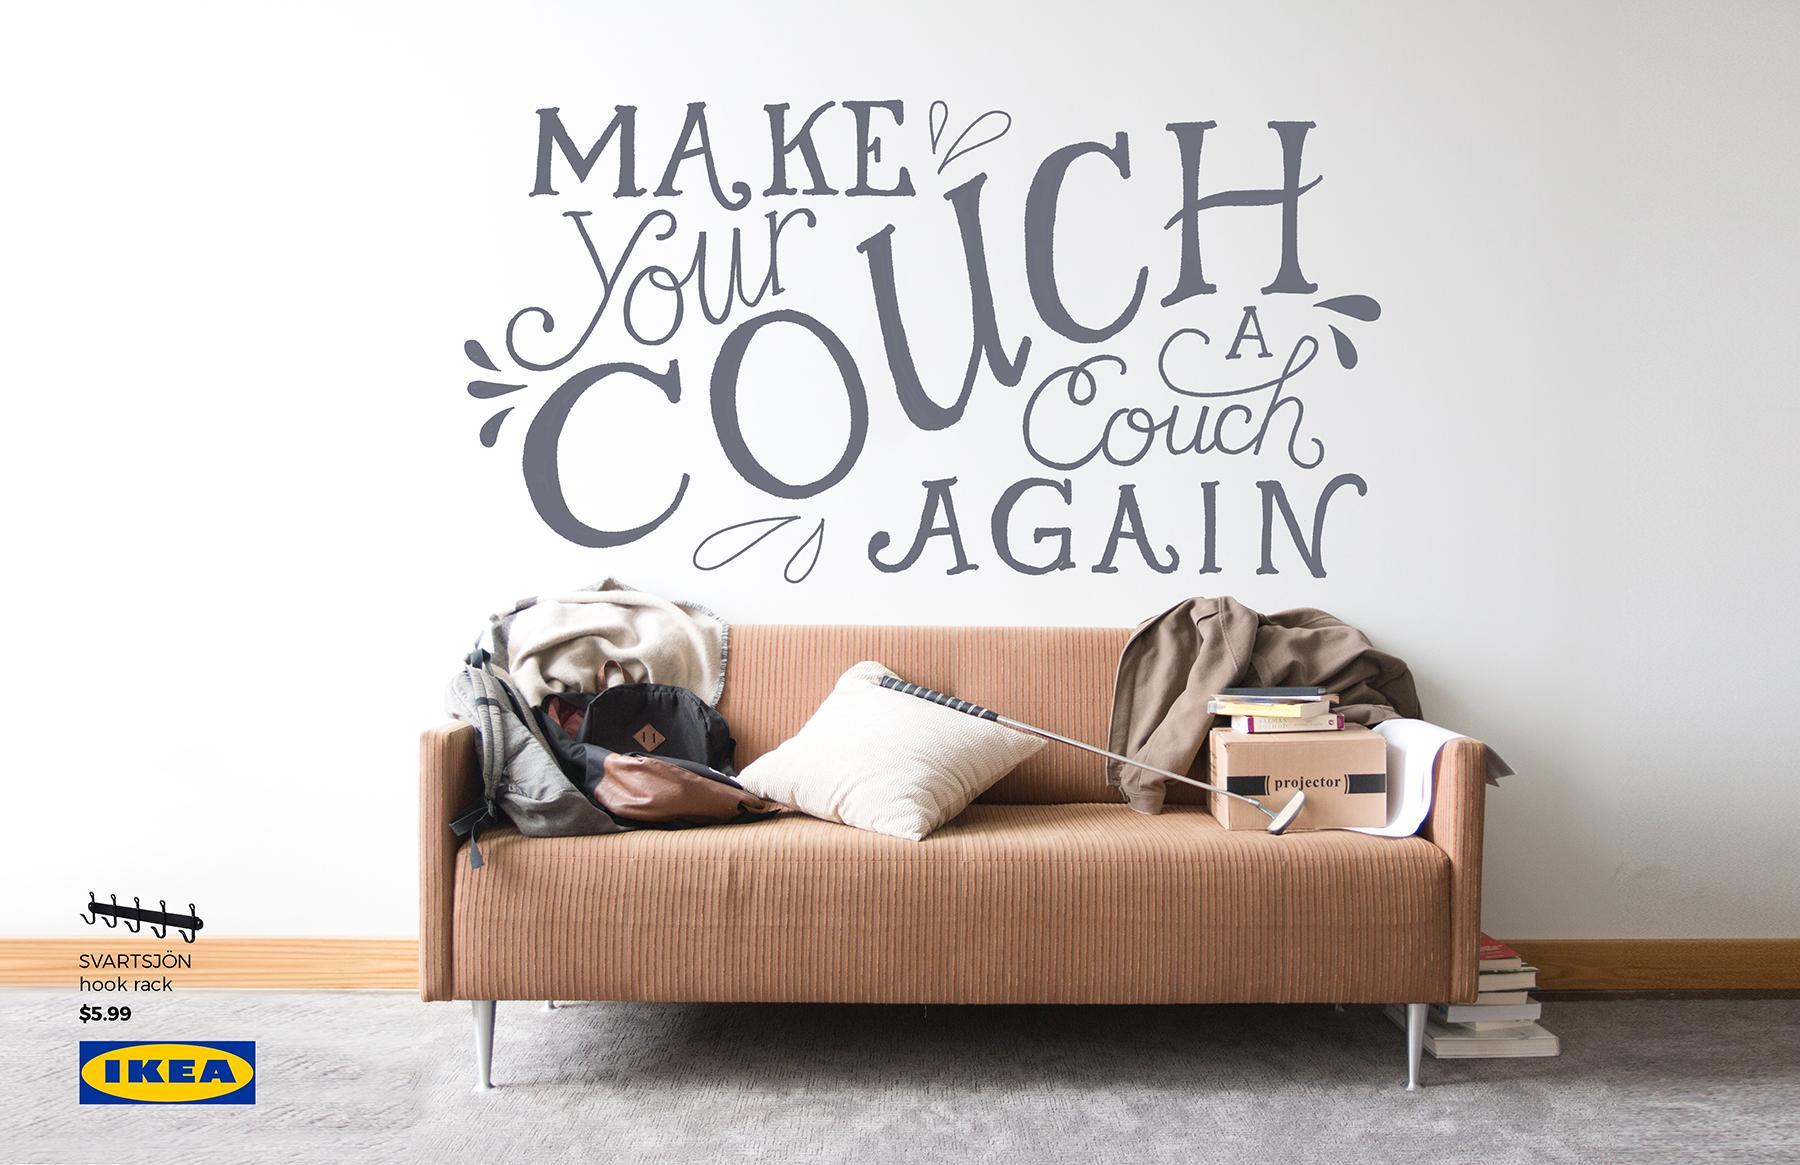 IKEA | Ads of the World™